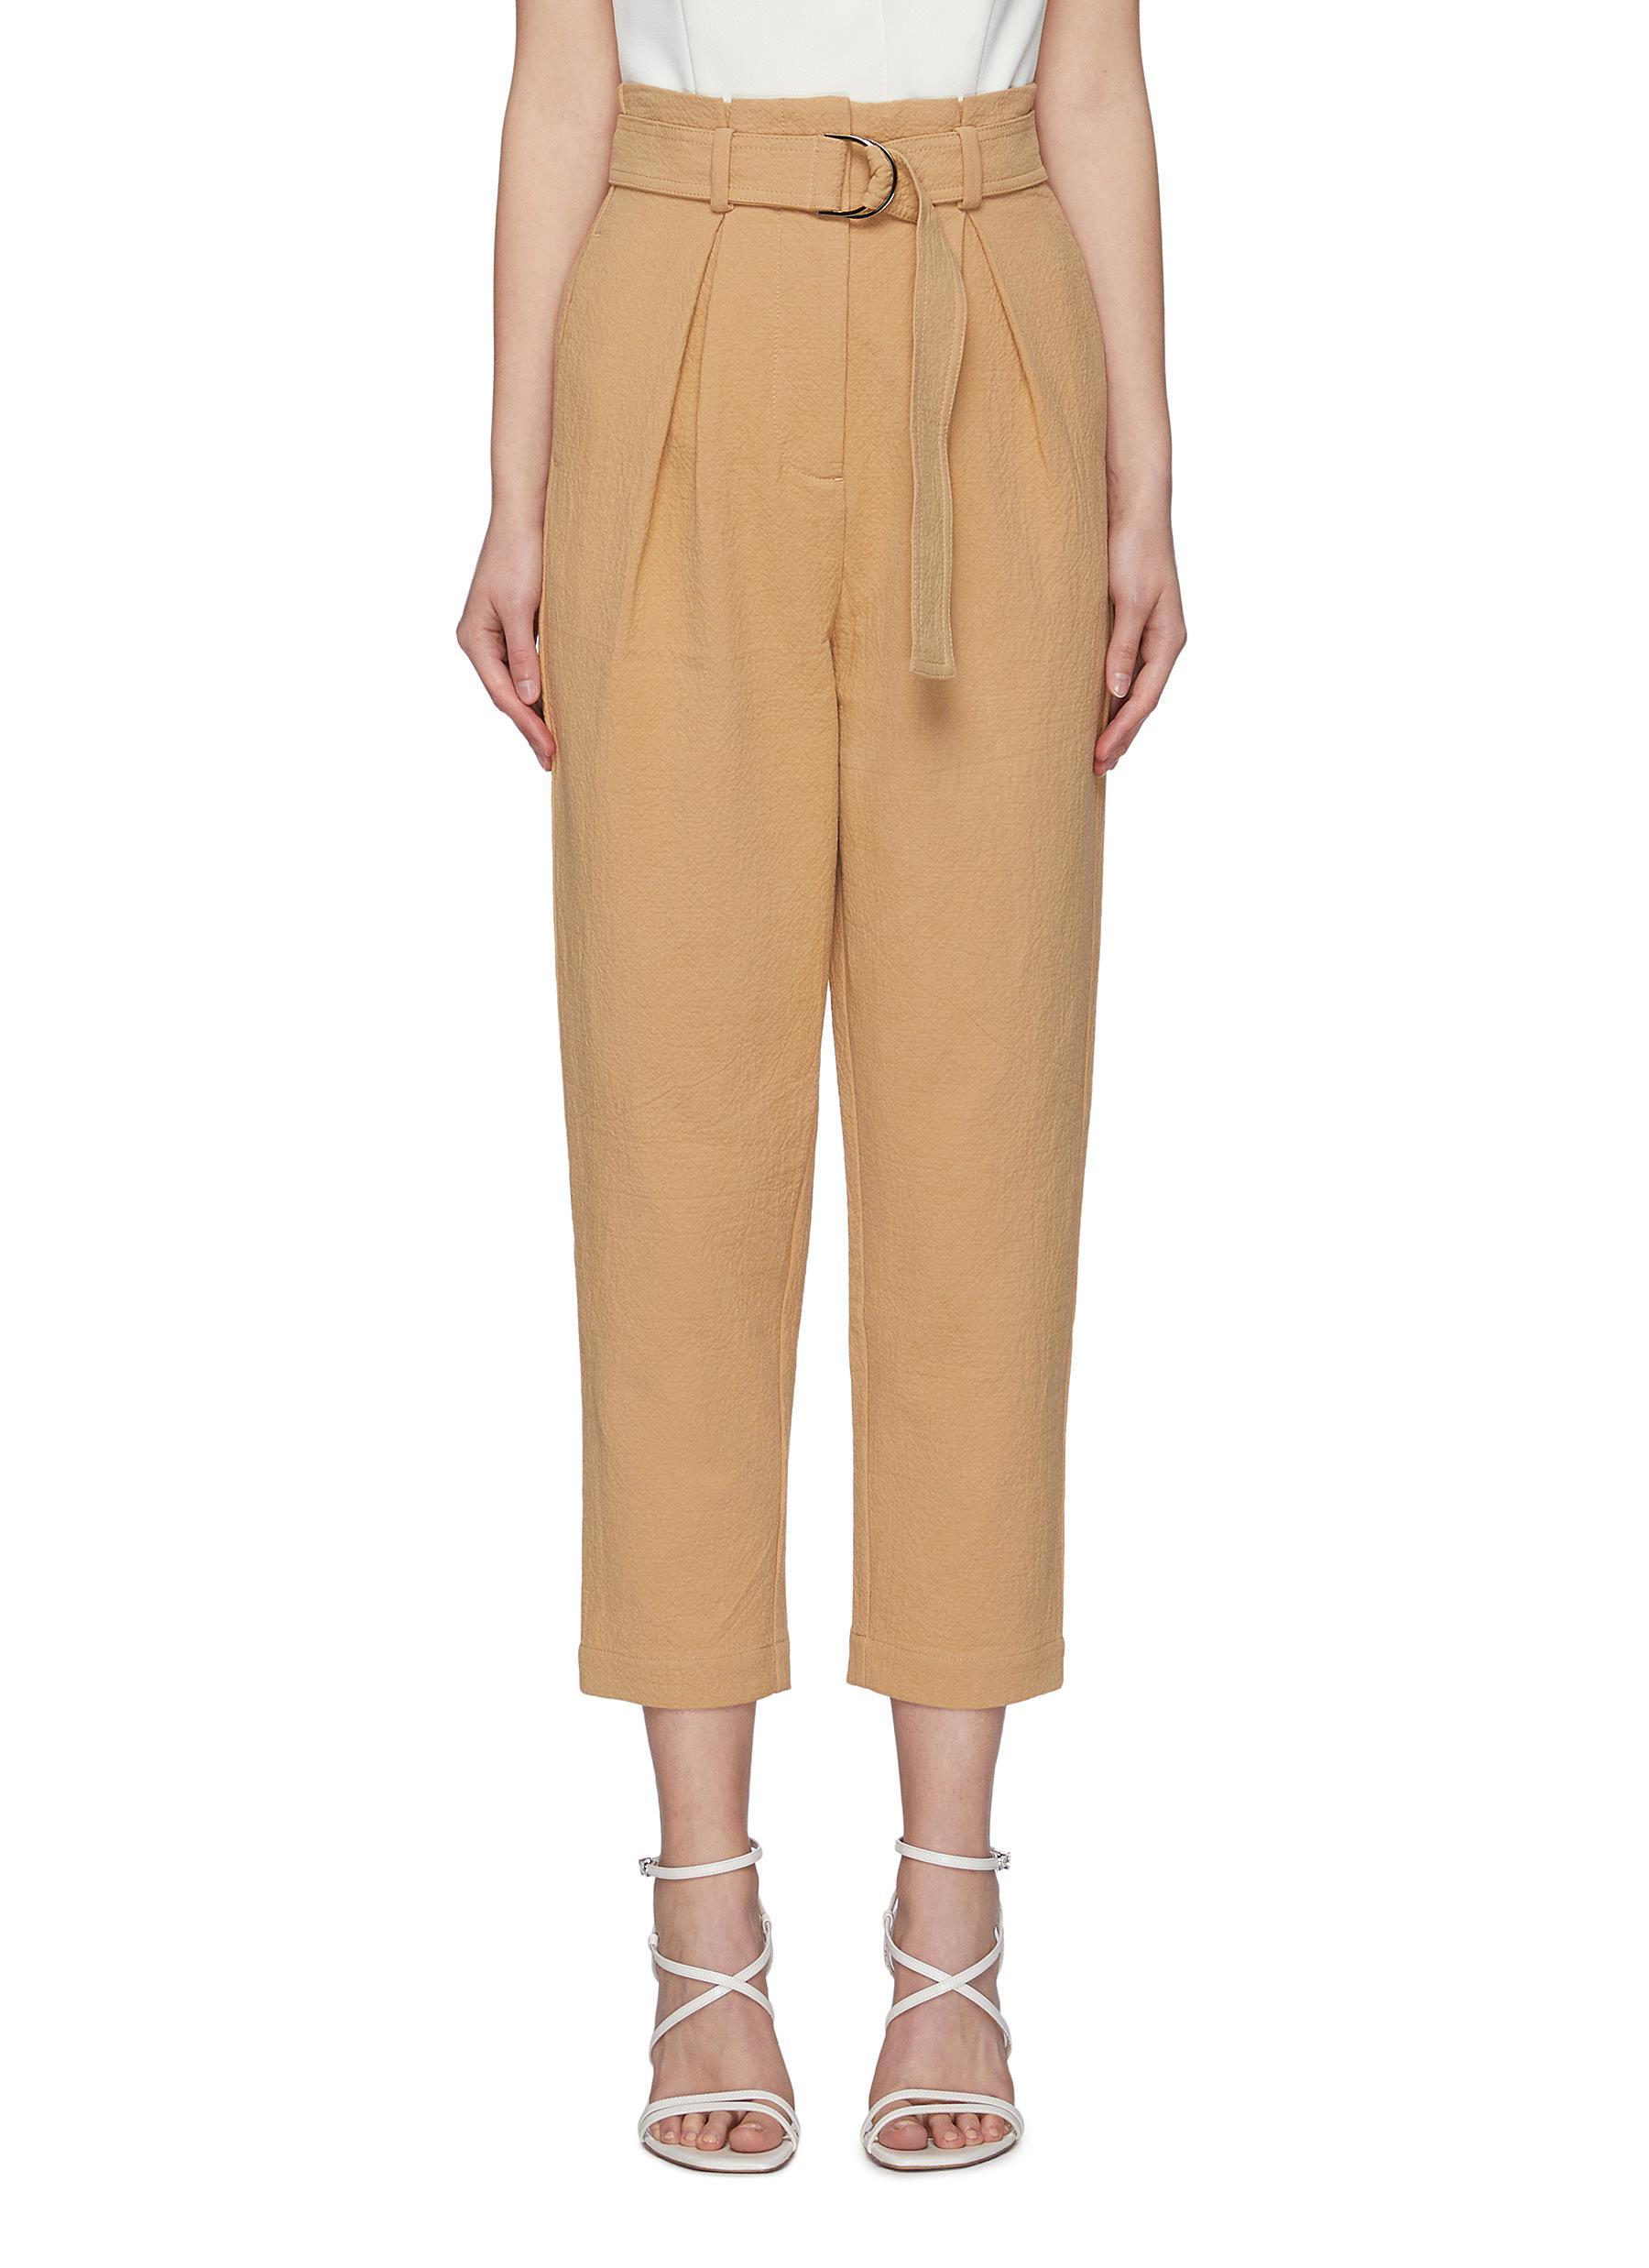 'Newton' Belted Front Pleat Crop Pants